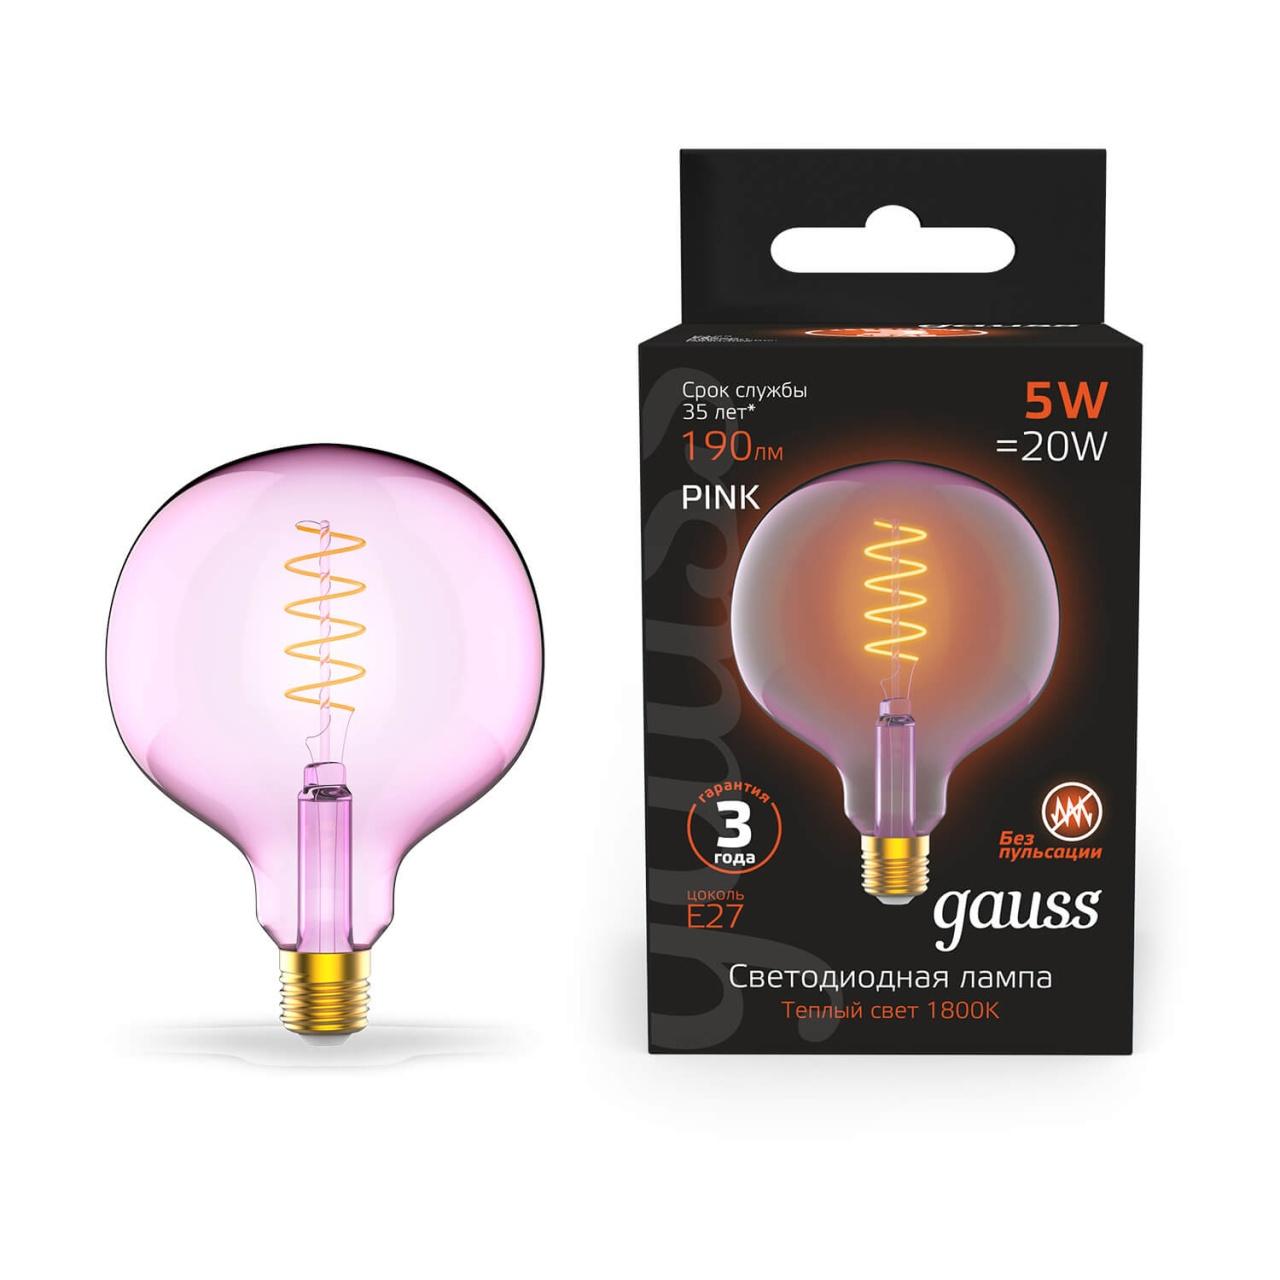 Лампочка Gauss 1011802105 Colored (Диммирование) лампочка gauss 1009802105 colored